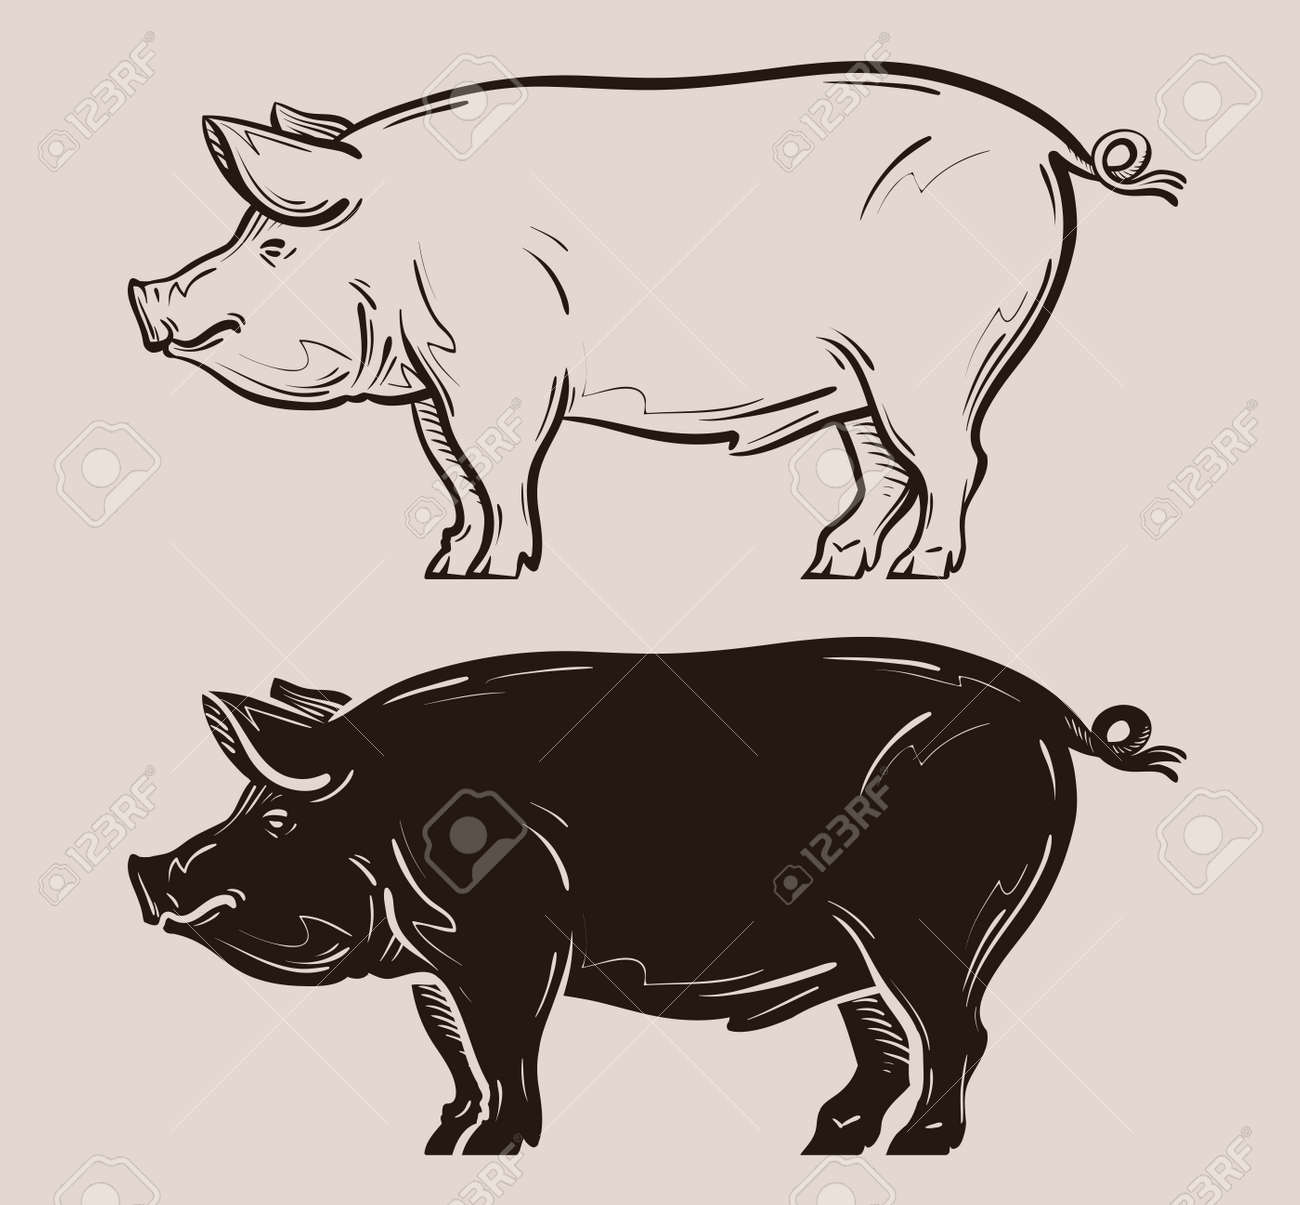 pig vector farm pork or piggy icon royalty free cliparts vectors rh 123rf com pig vector free pig vector art